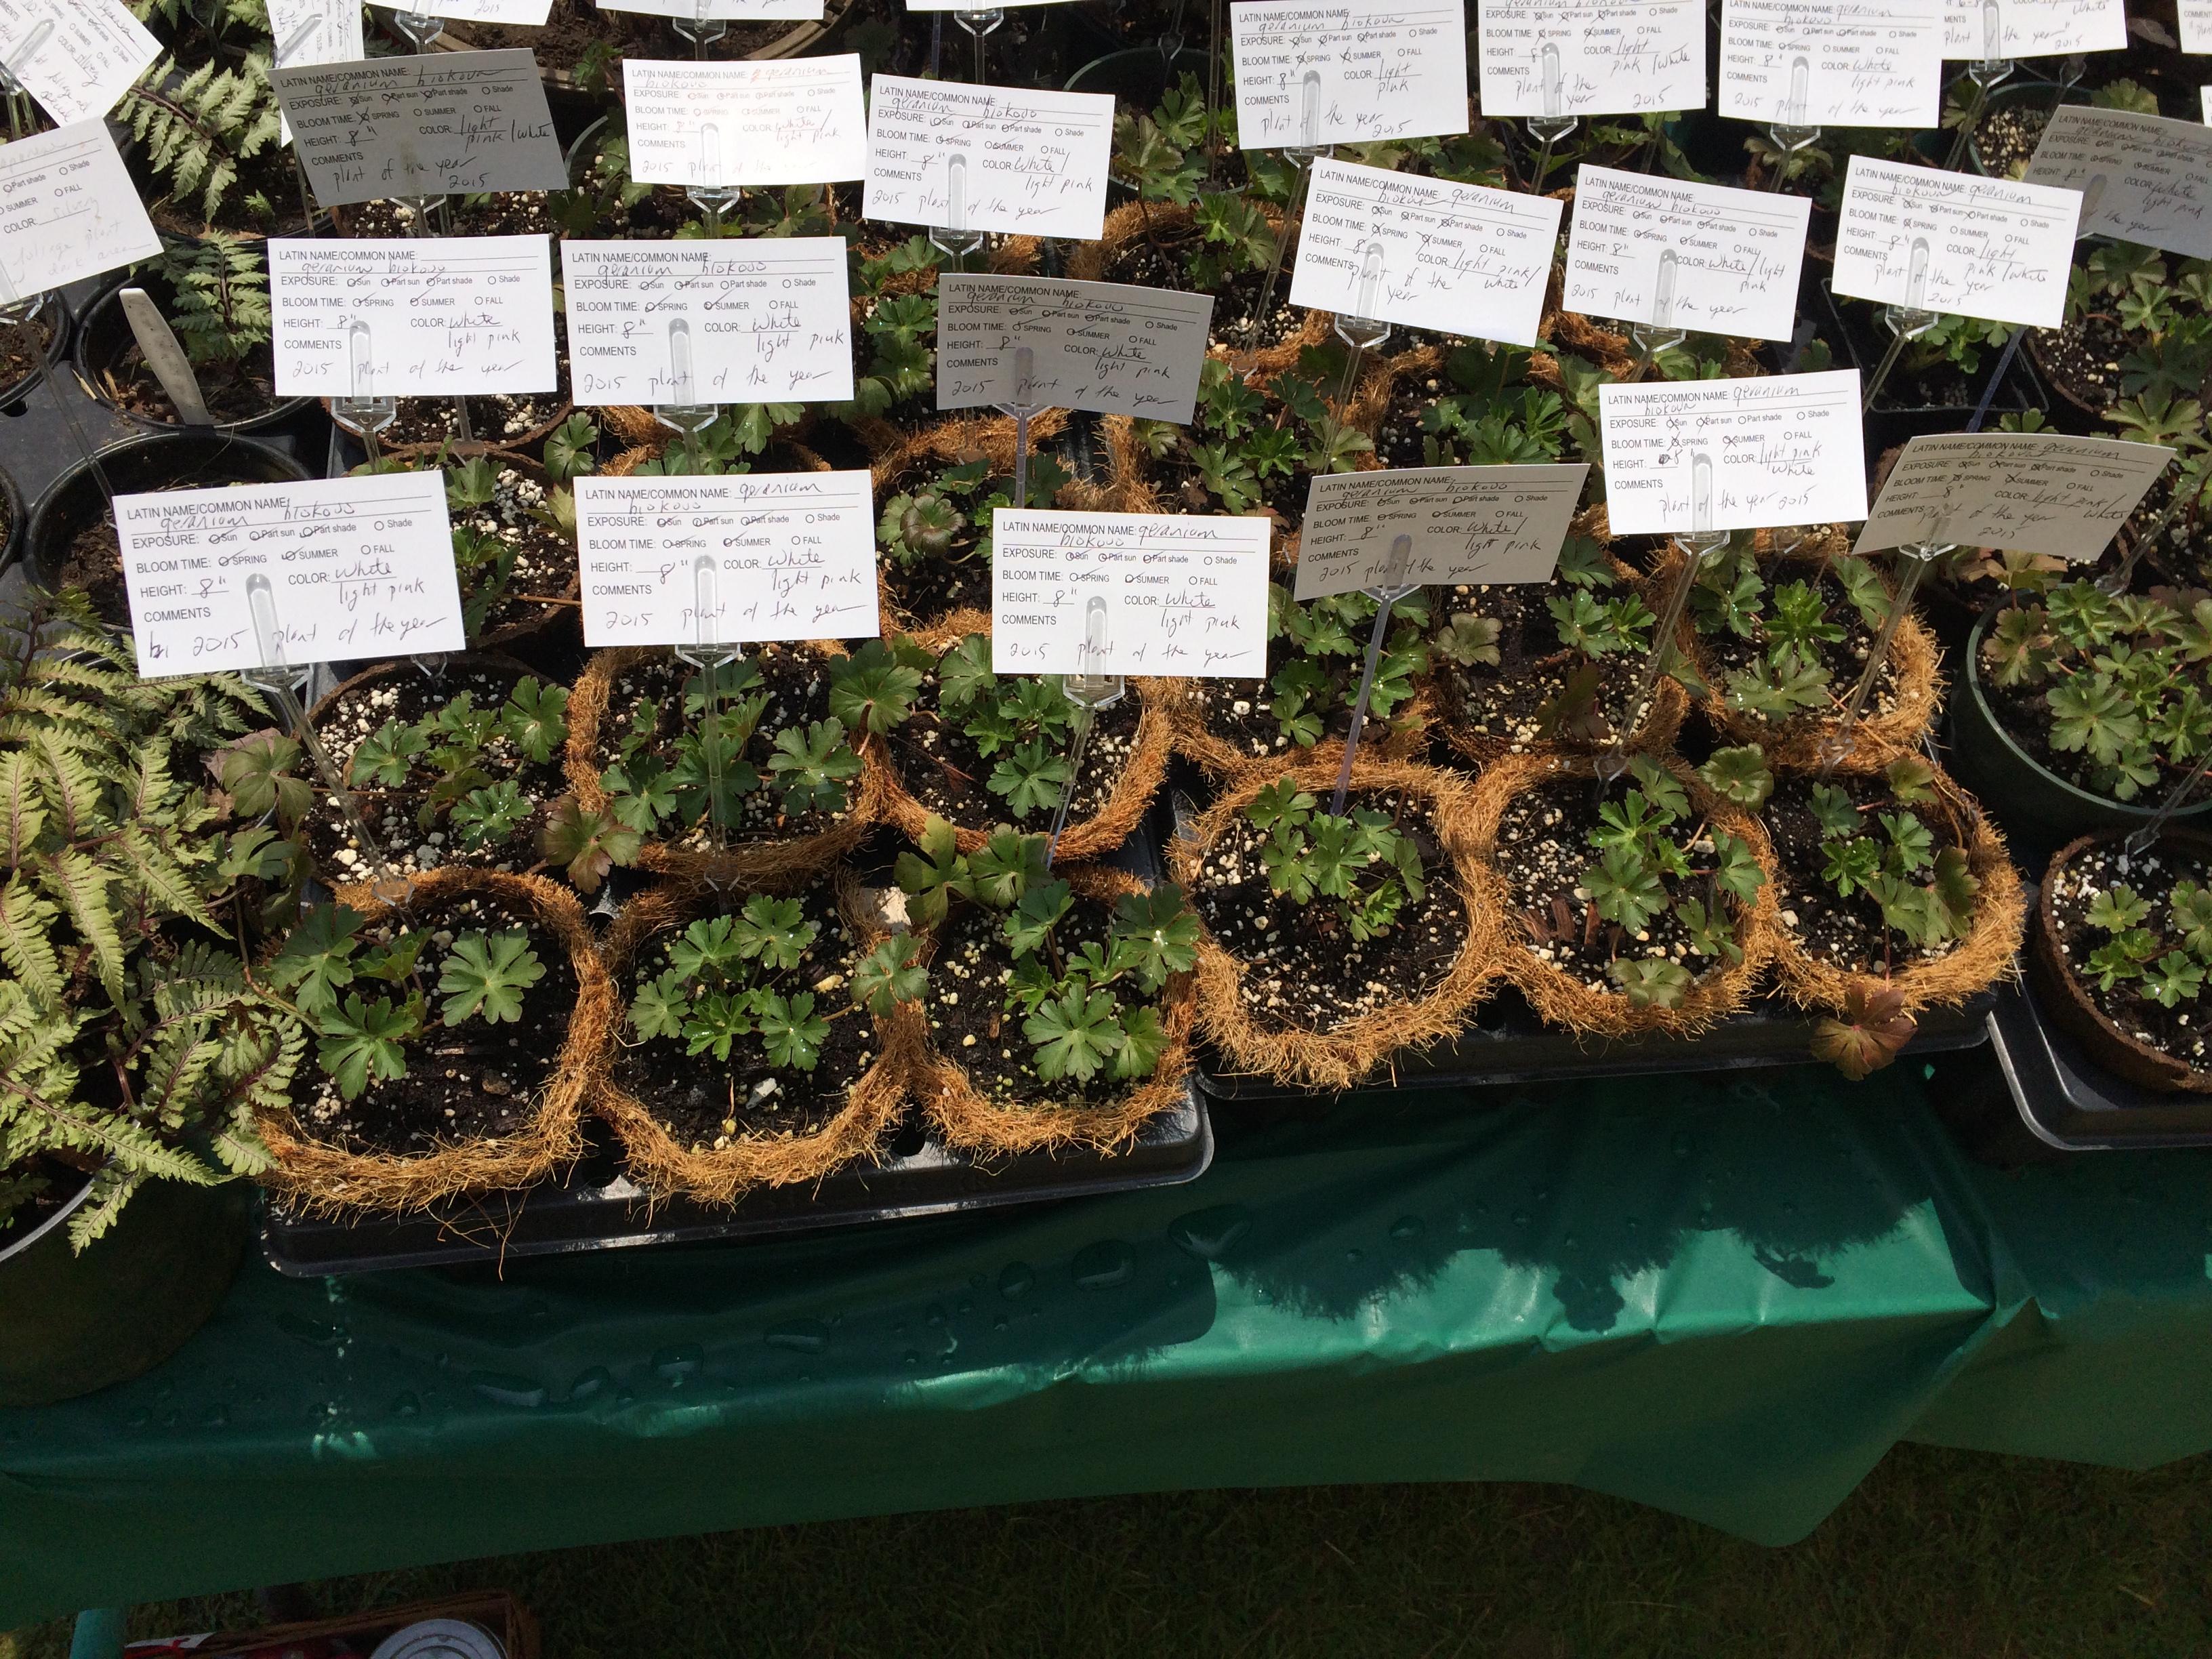 Monadnock Garden Club Plant Sale - Historical Society of Chesire County